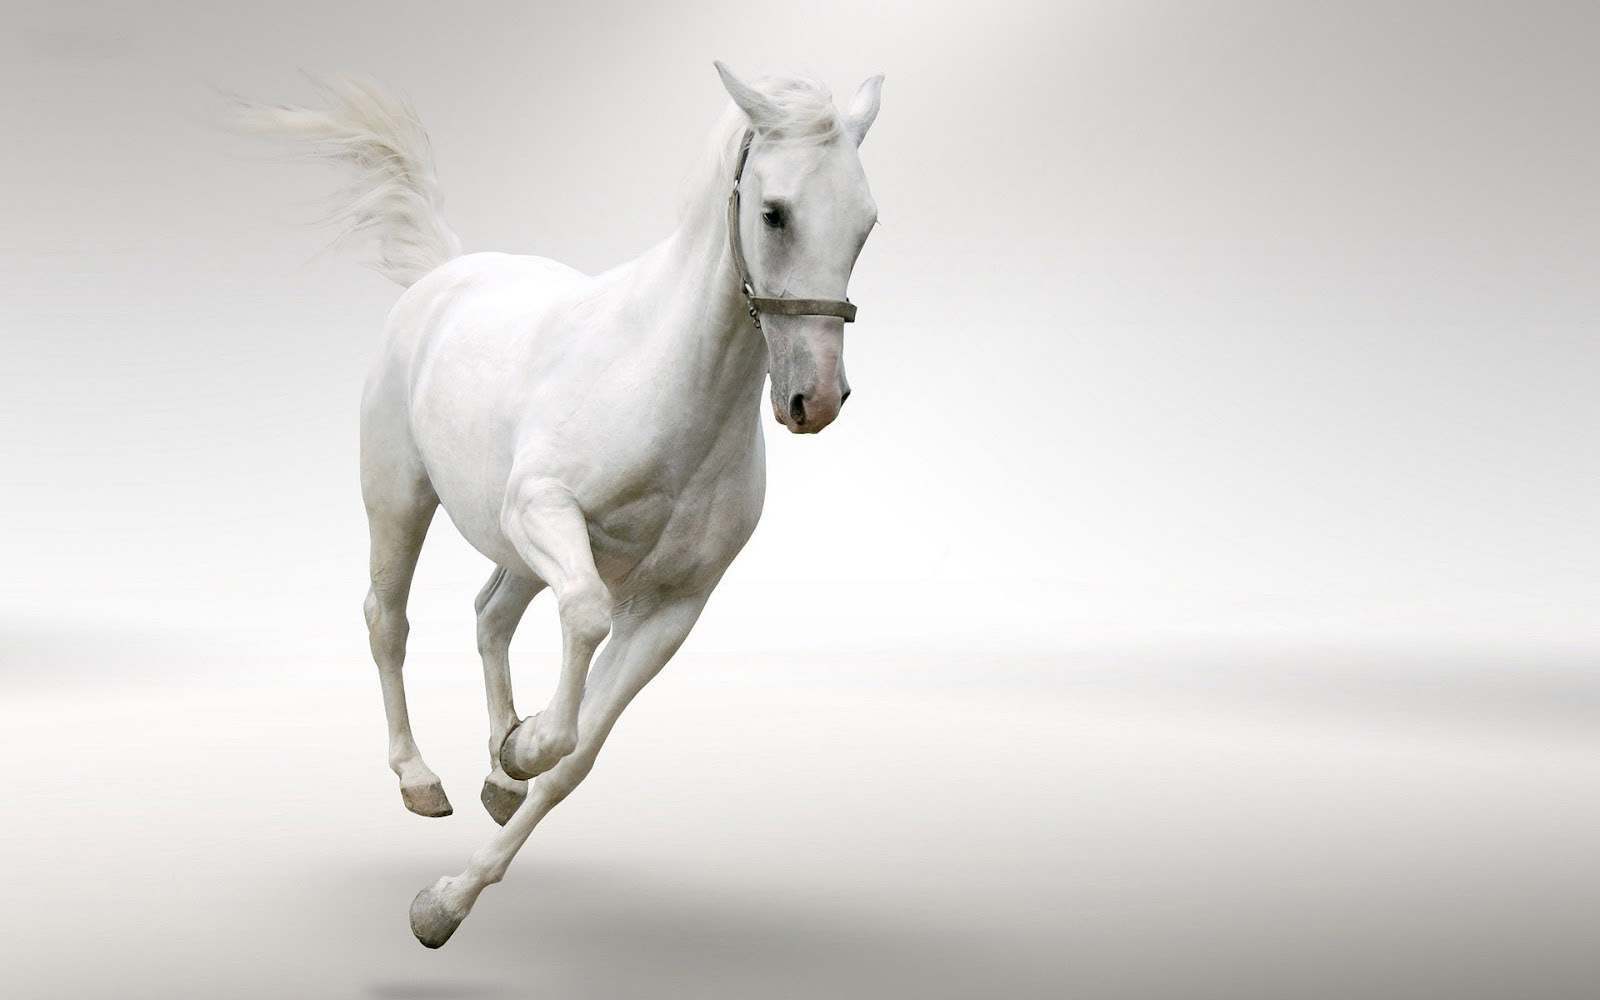 Stunning White Horse - Colors Photo (34711713) - Fanpop